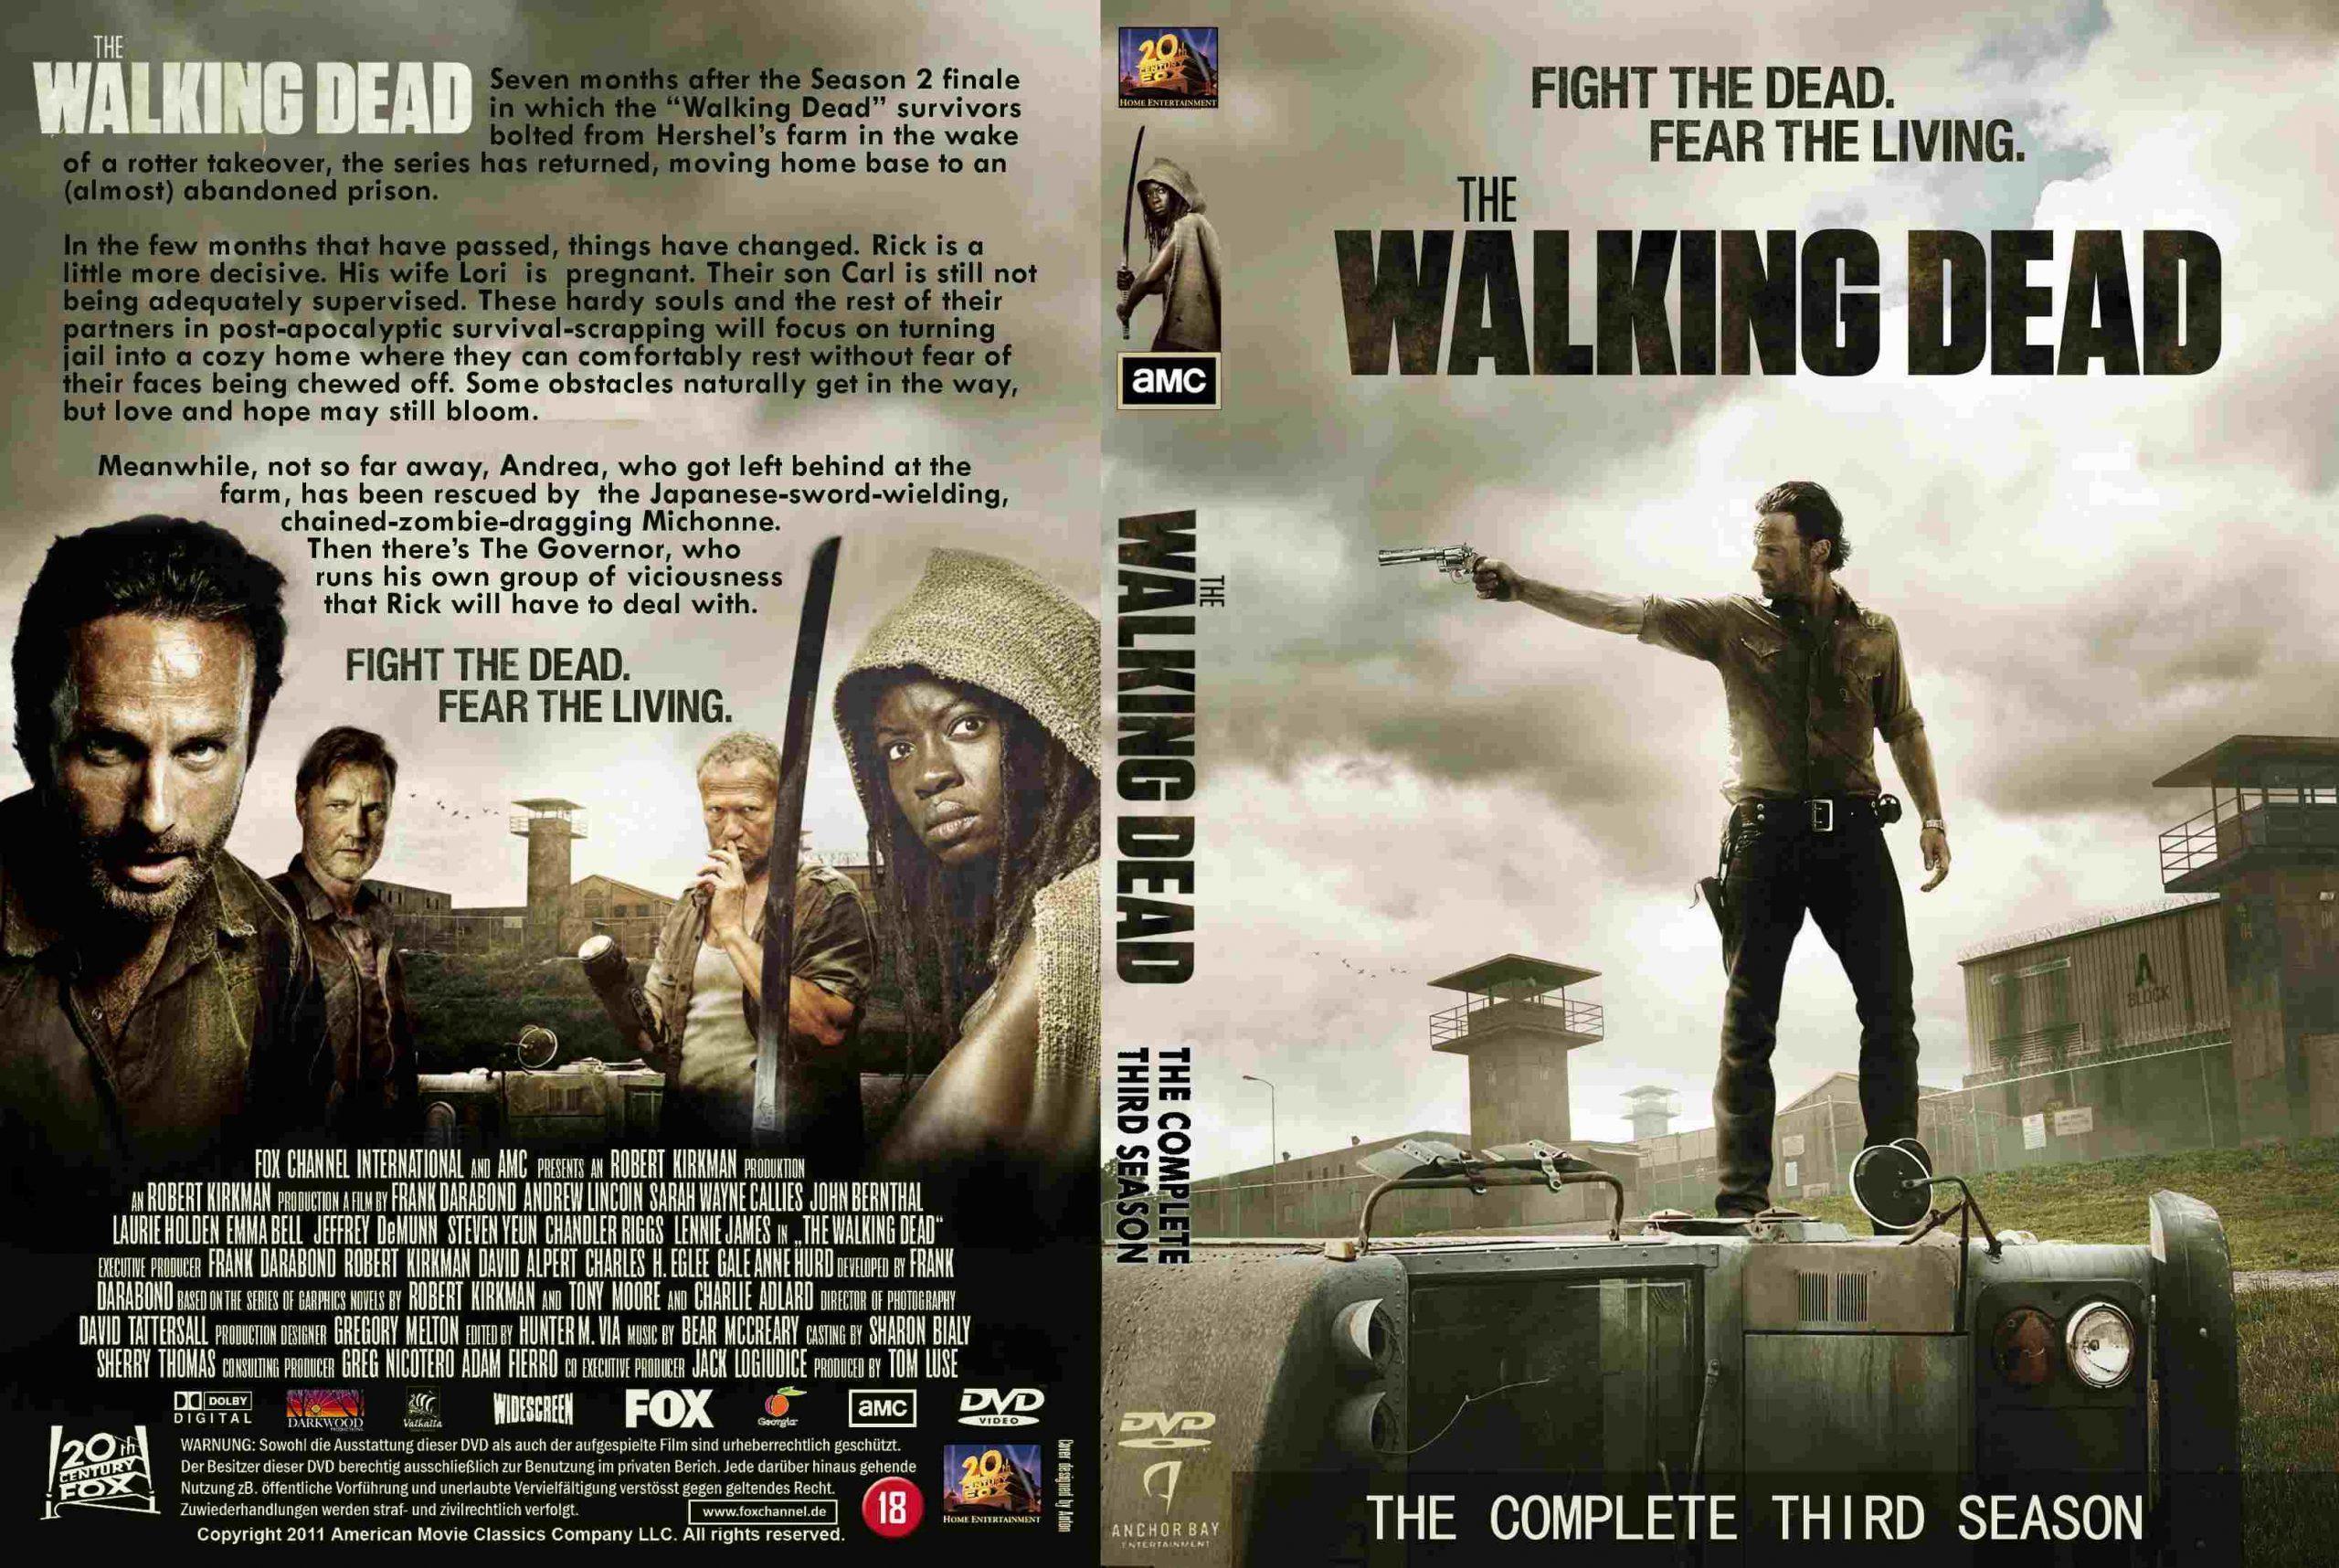 cover serial The Walking Dead 4s3.ir 1 scaled - سریال مردگان متحرک The Walking Dead  دوبله فارسی  فصل دوم قسمت ۶